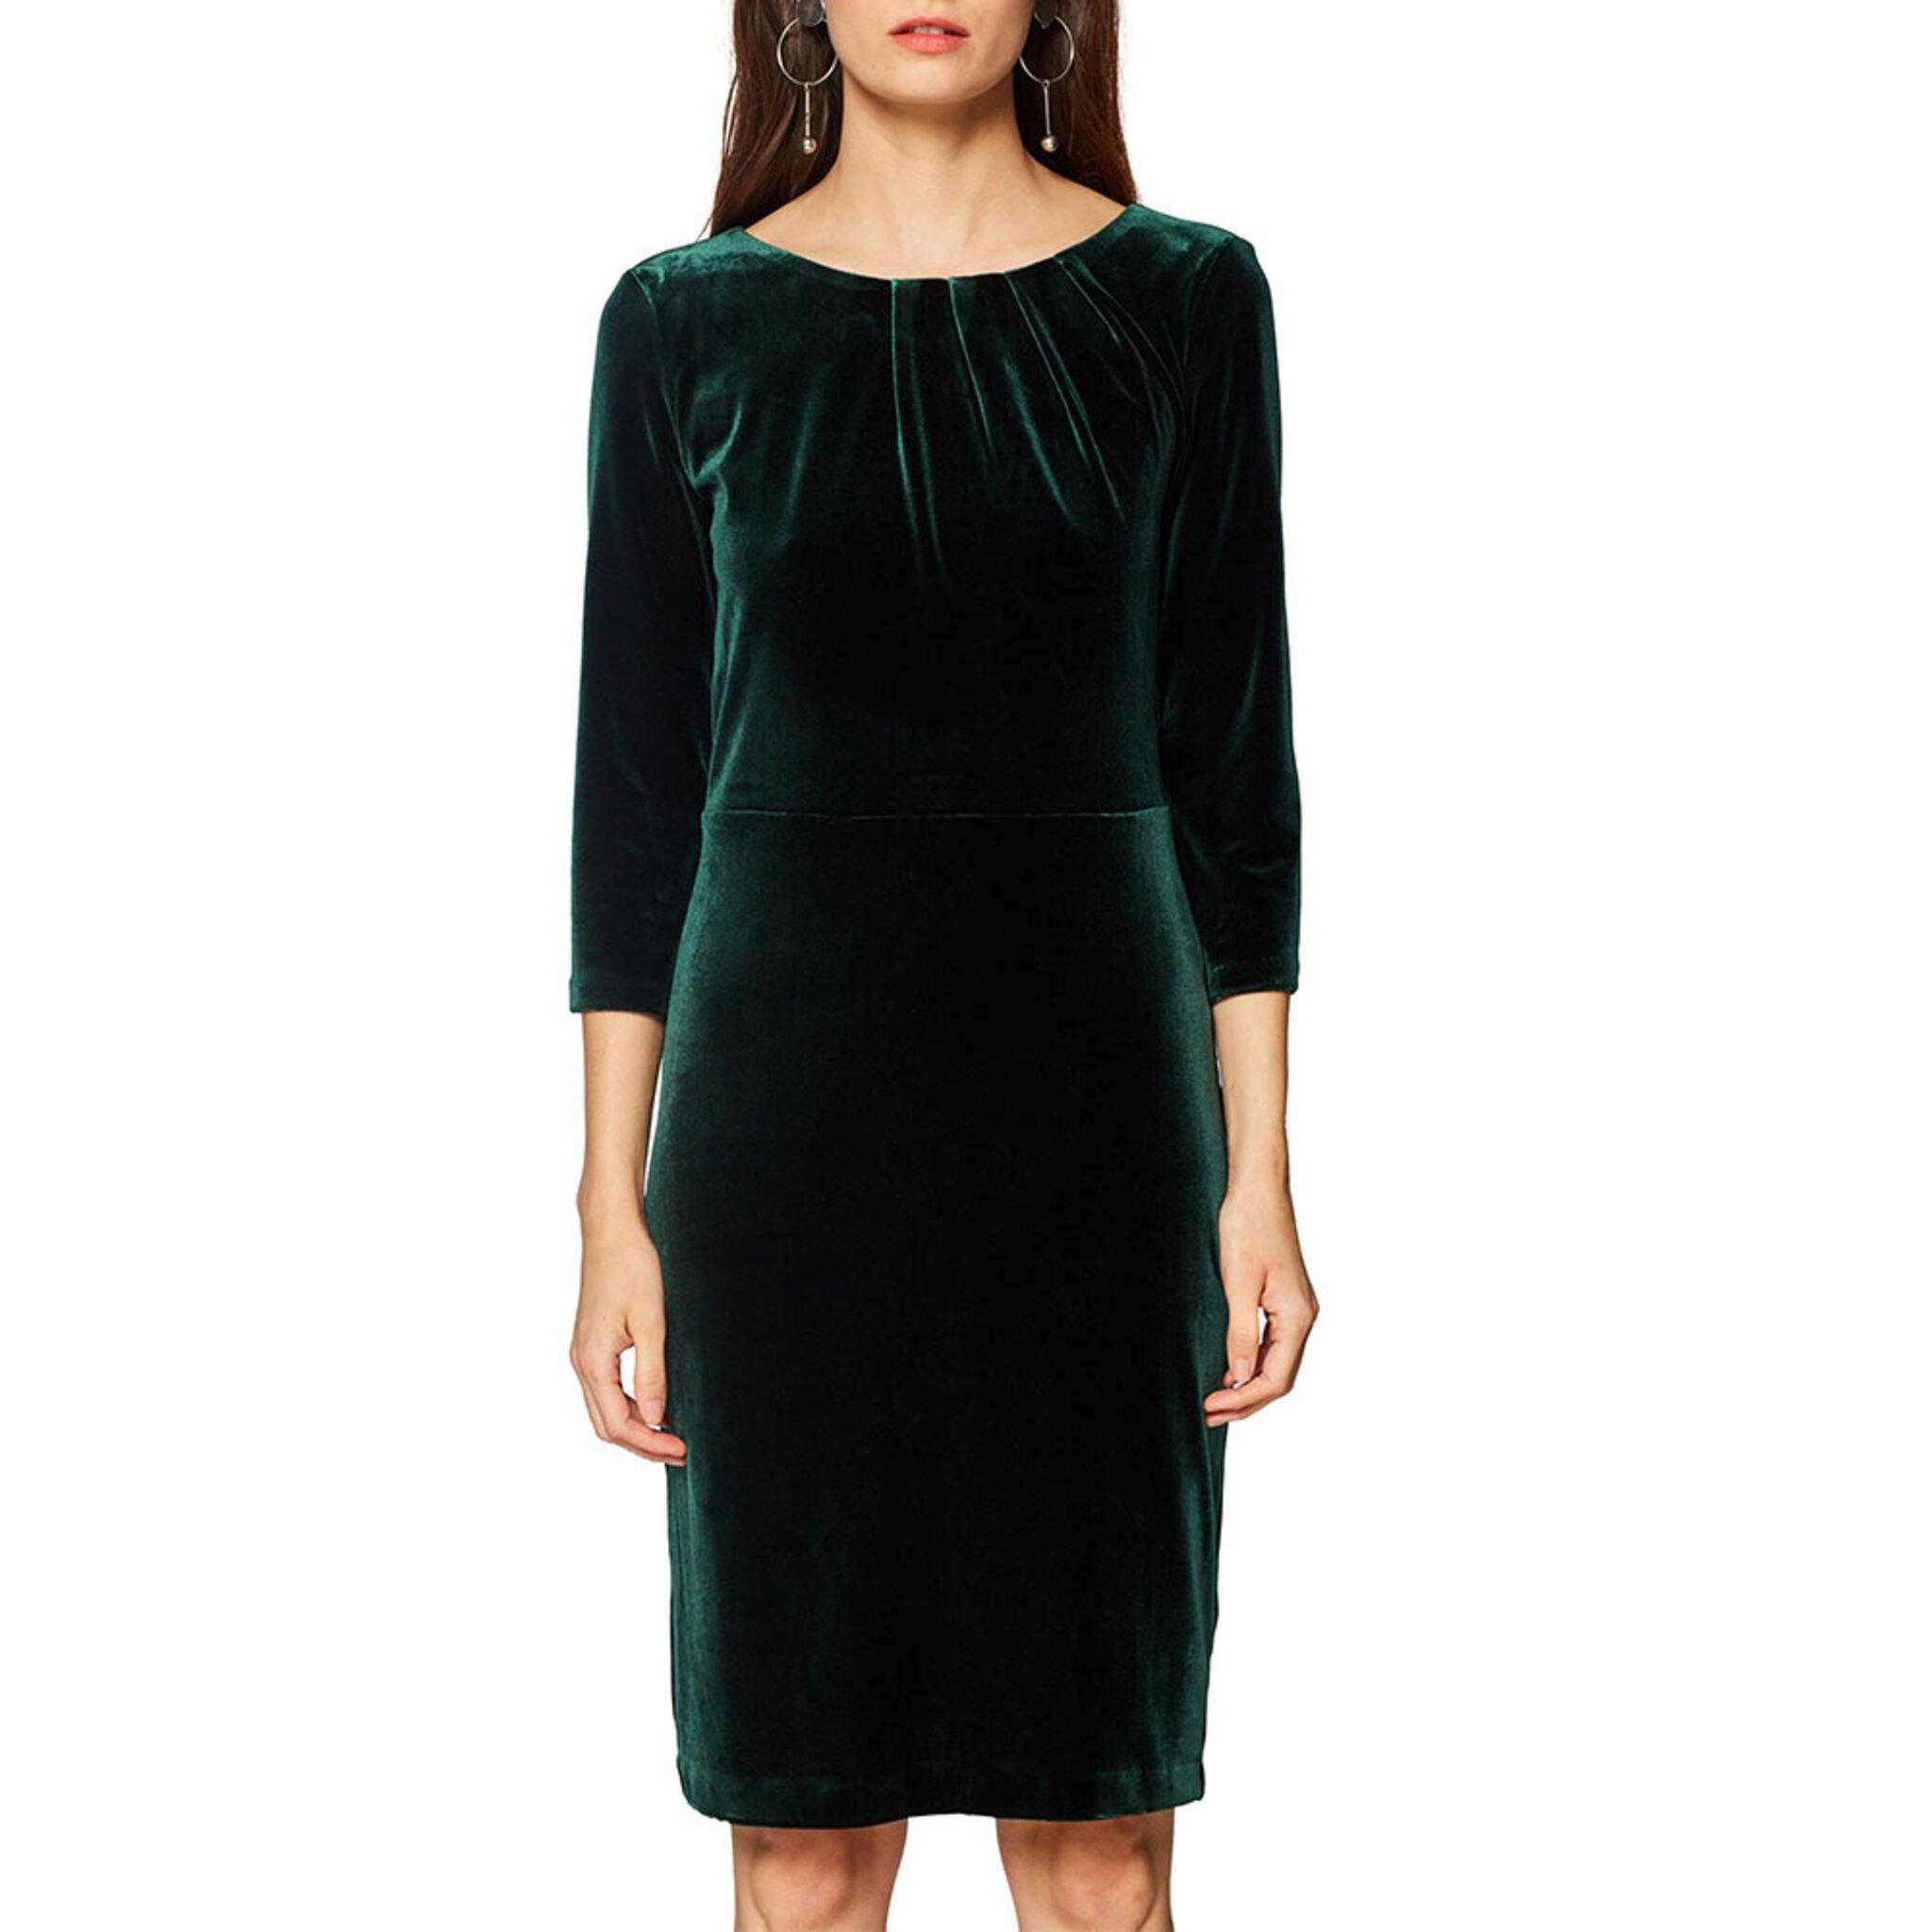 grön klänning sammet